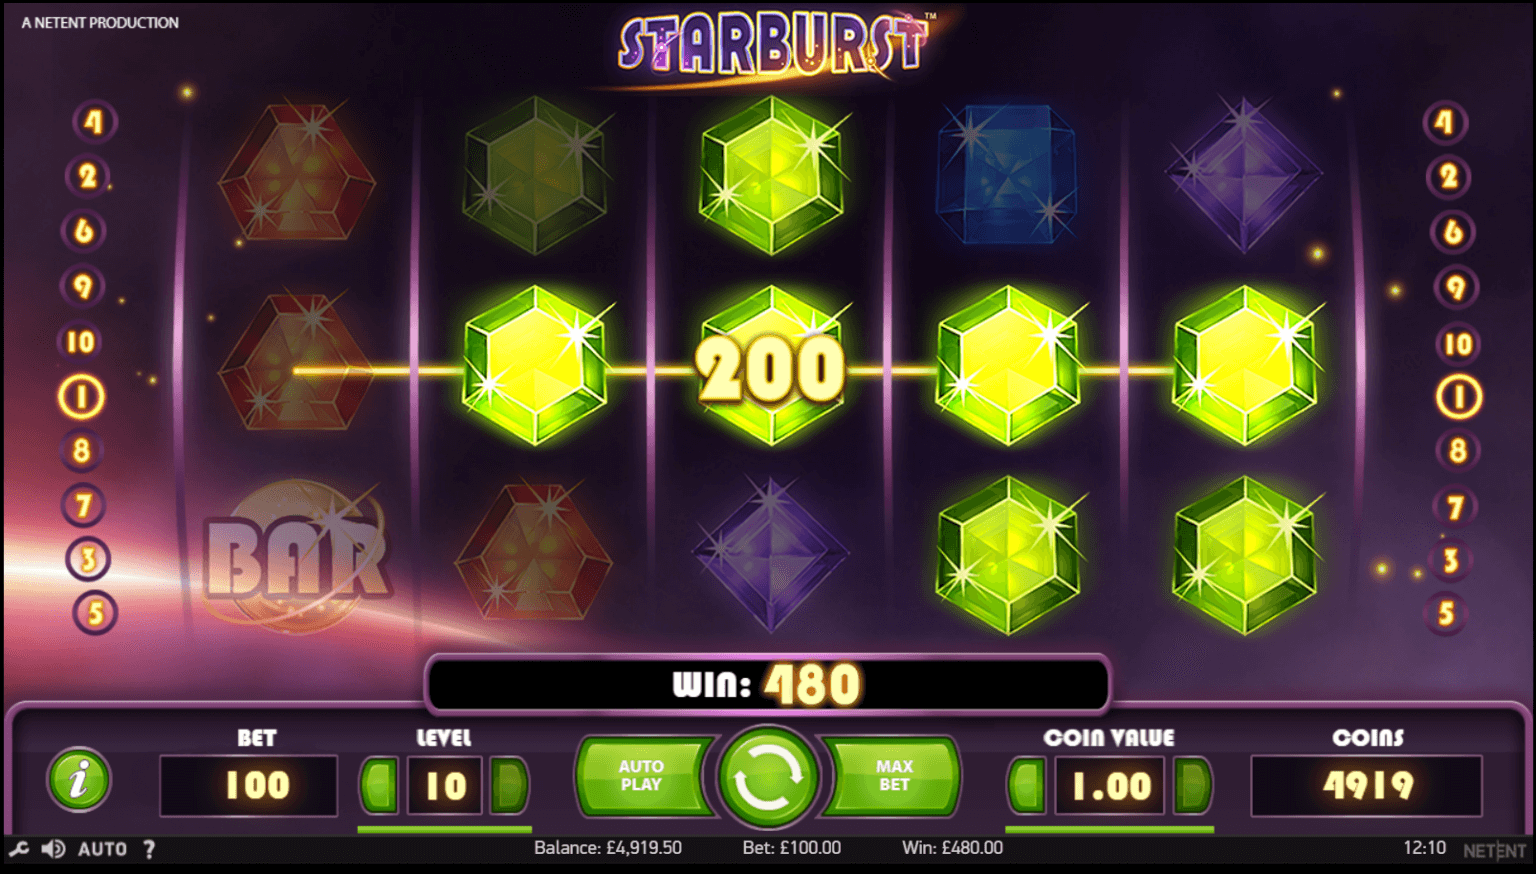 A screenshot of the incredible Starburst Slot